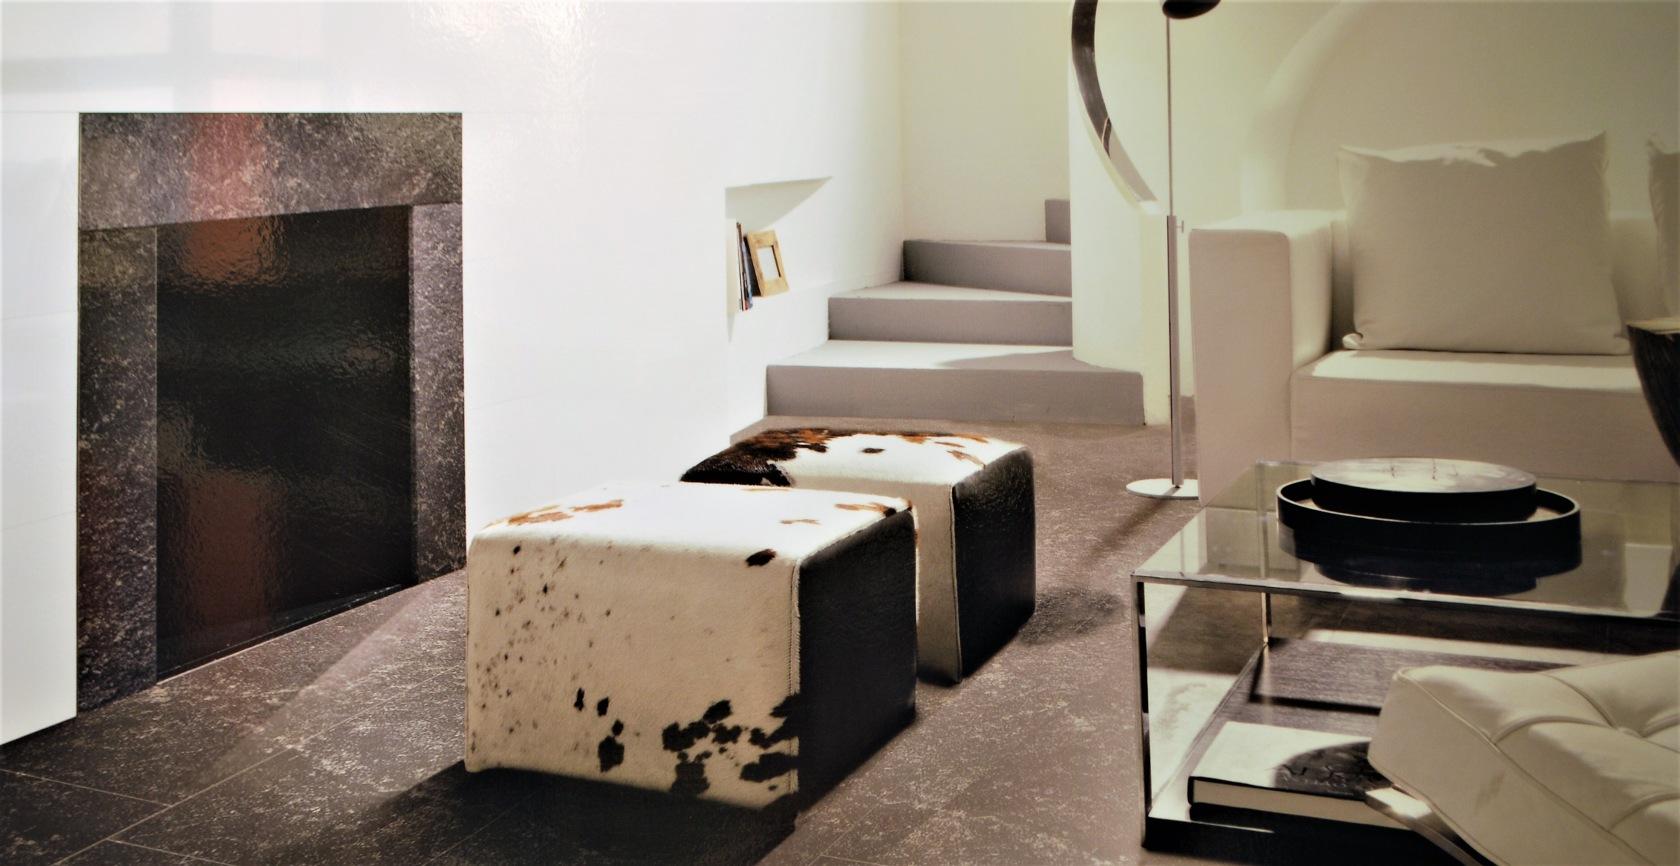 fliesen produkte tomaku. Black Bedroom Furniture Sets. Home Design Ideas